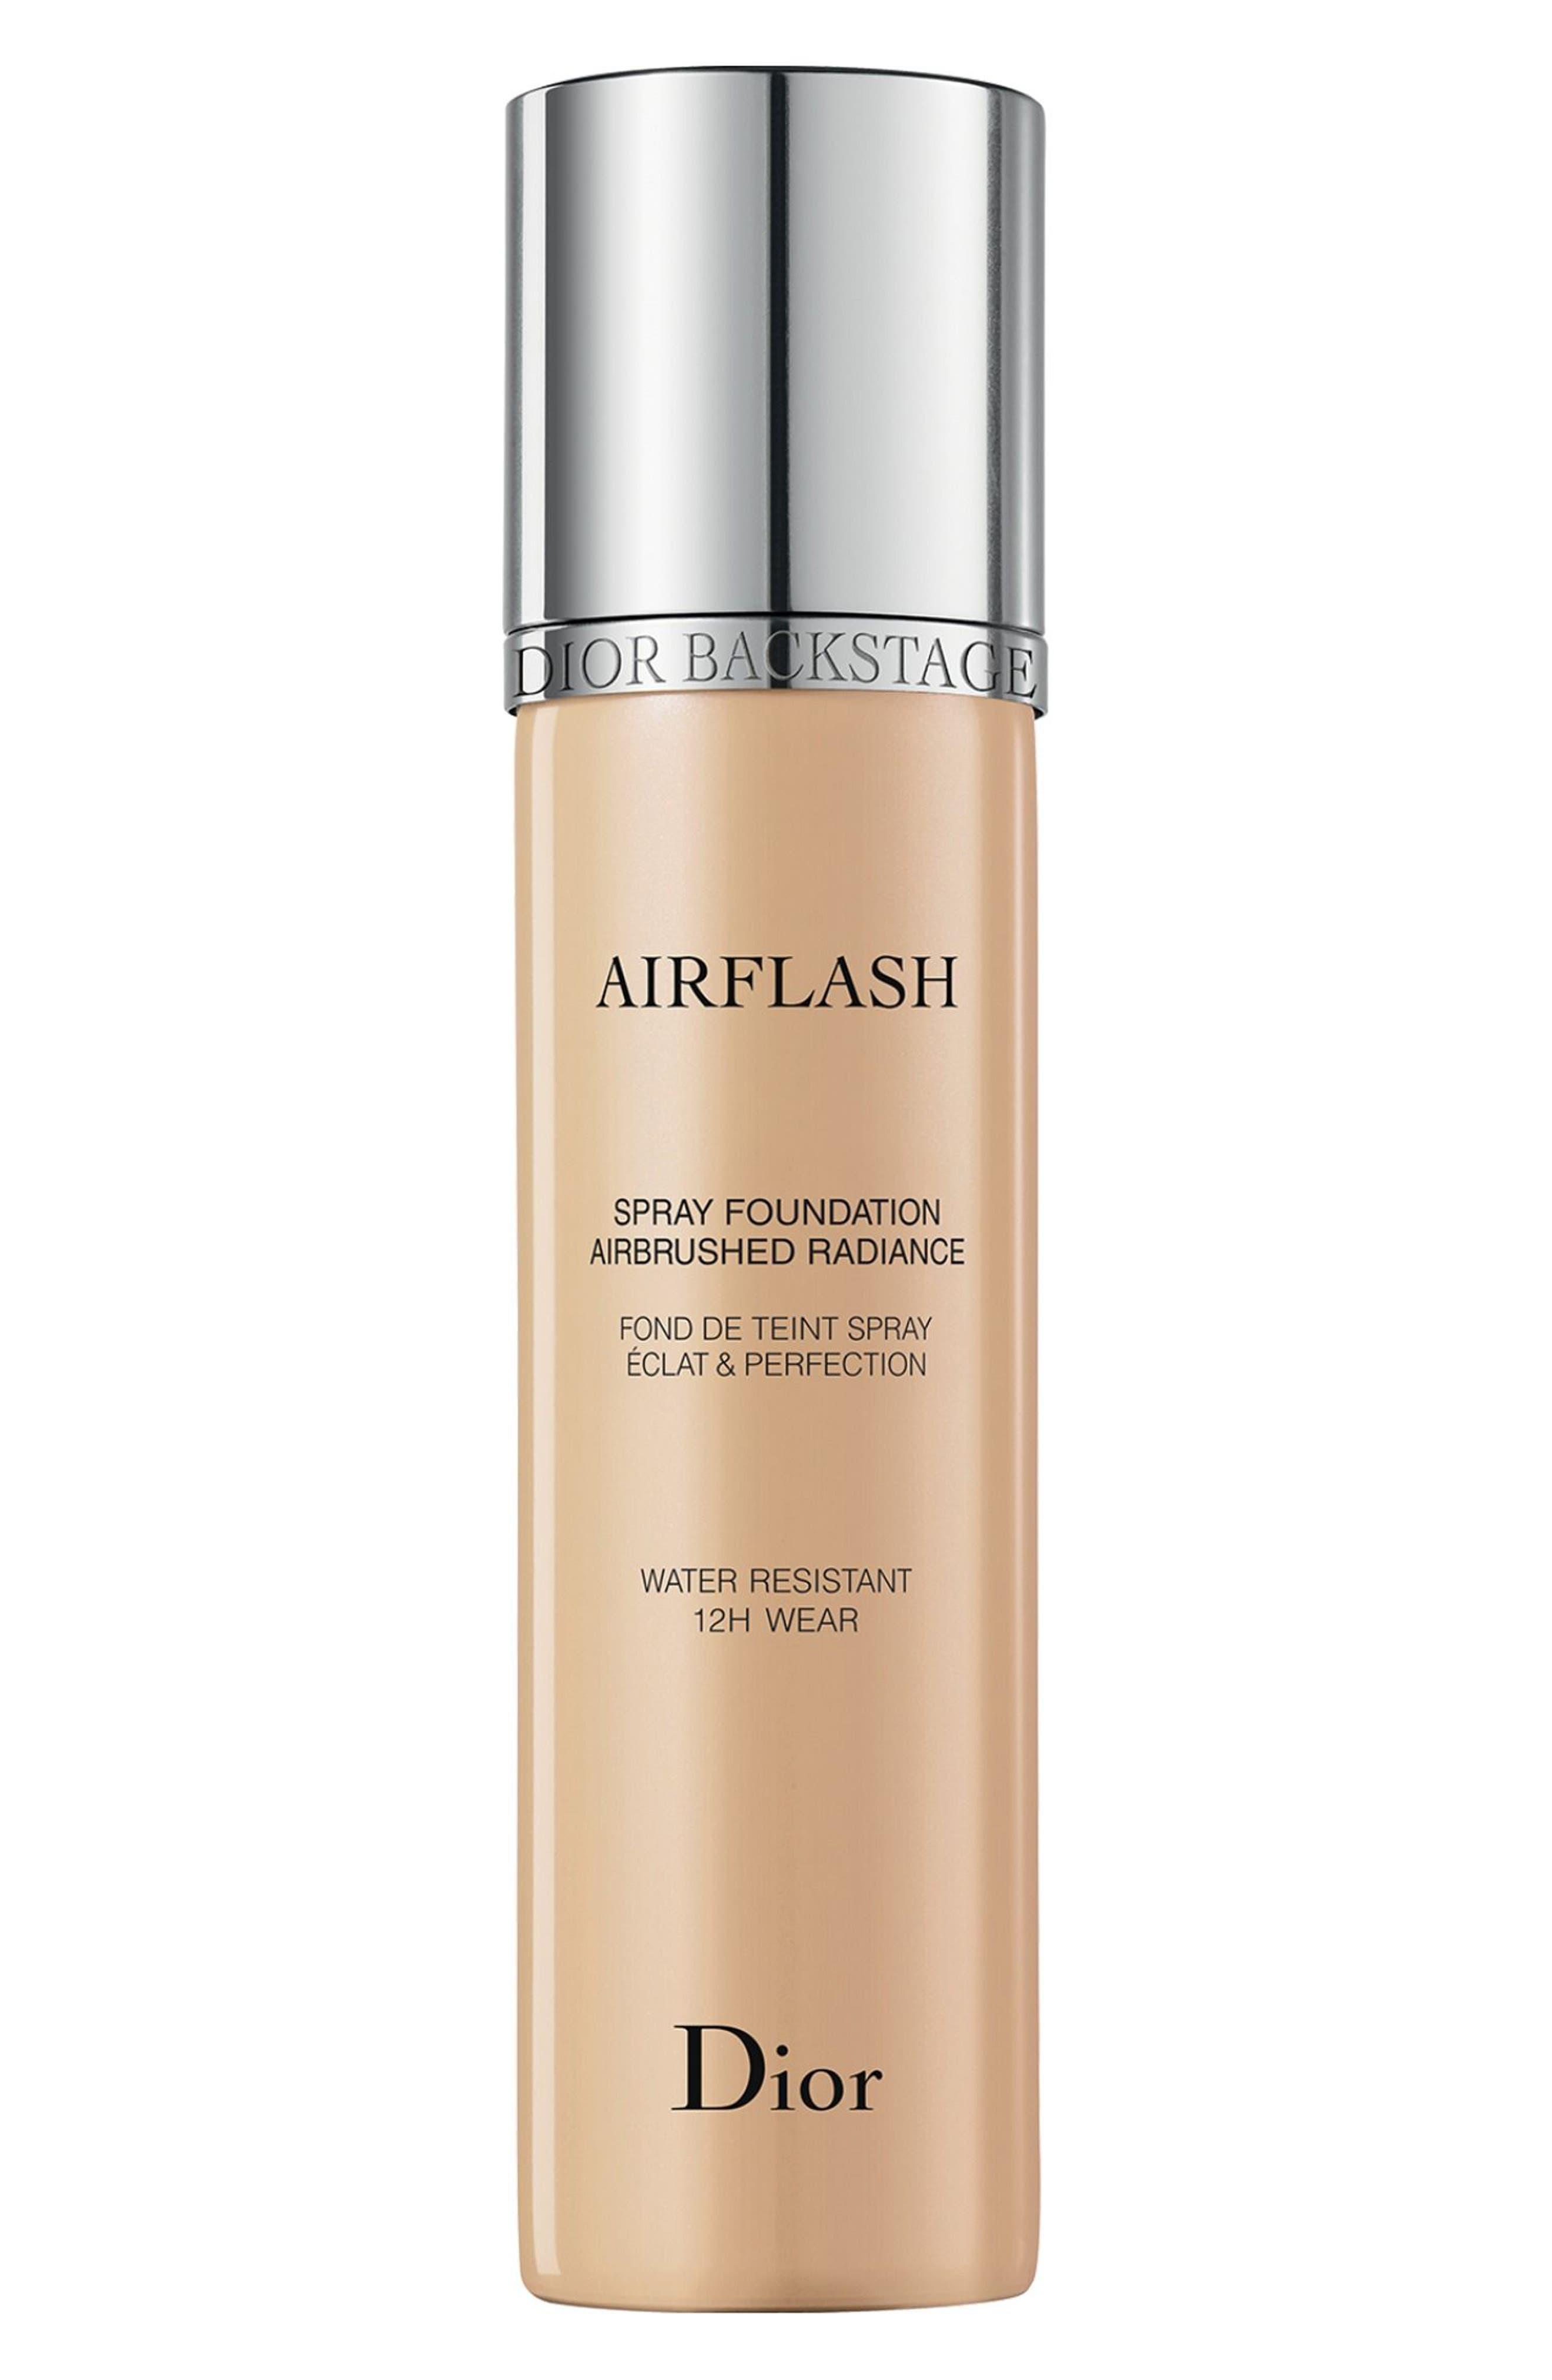 Dior Diorskin Airflash Spray Foundation - 104 Fair Almond